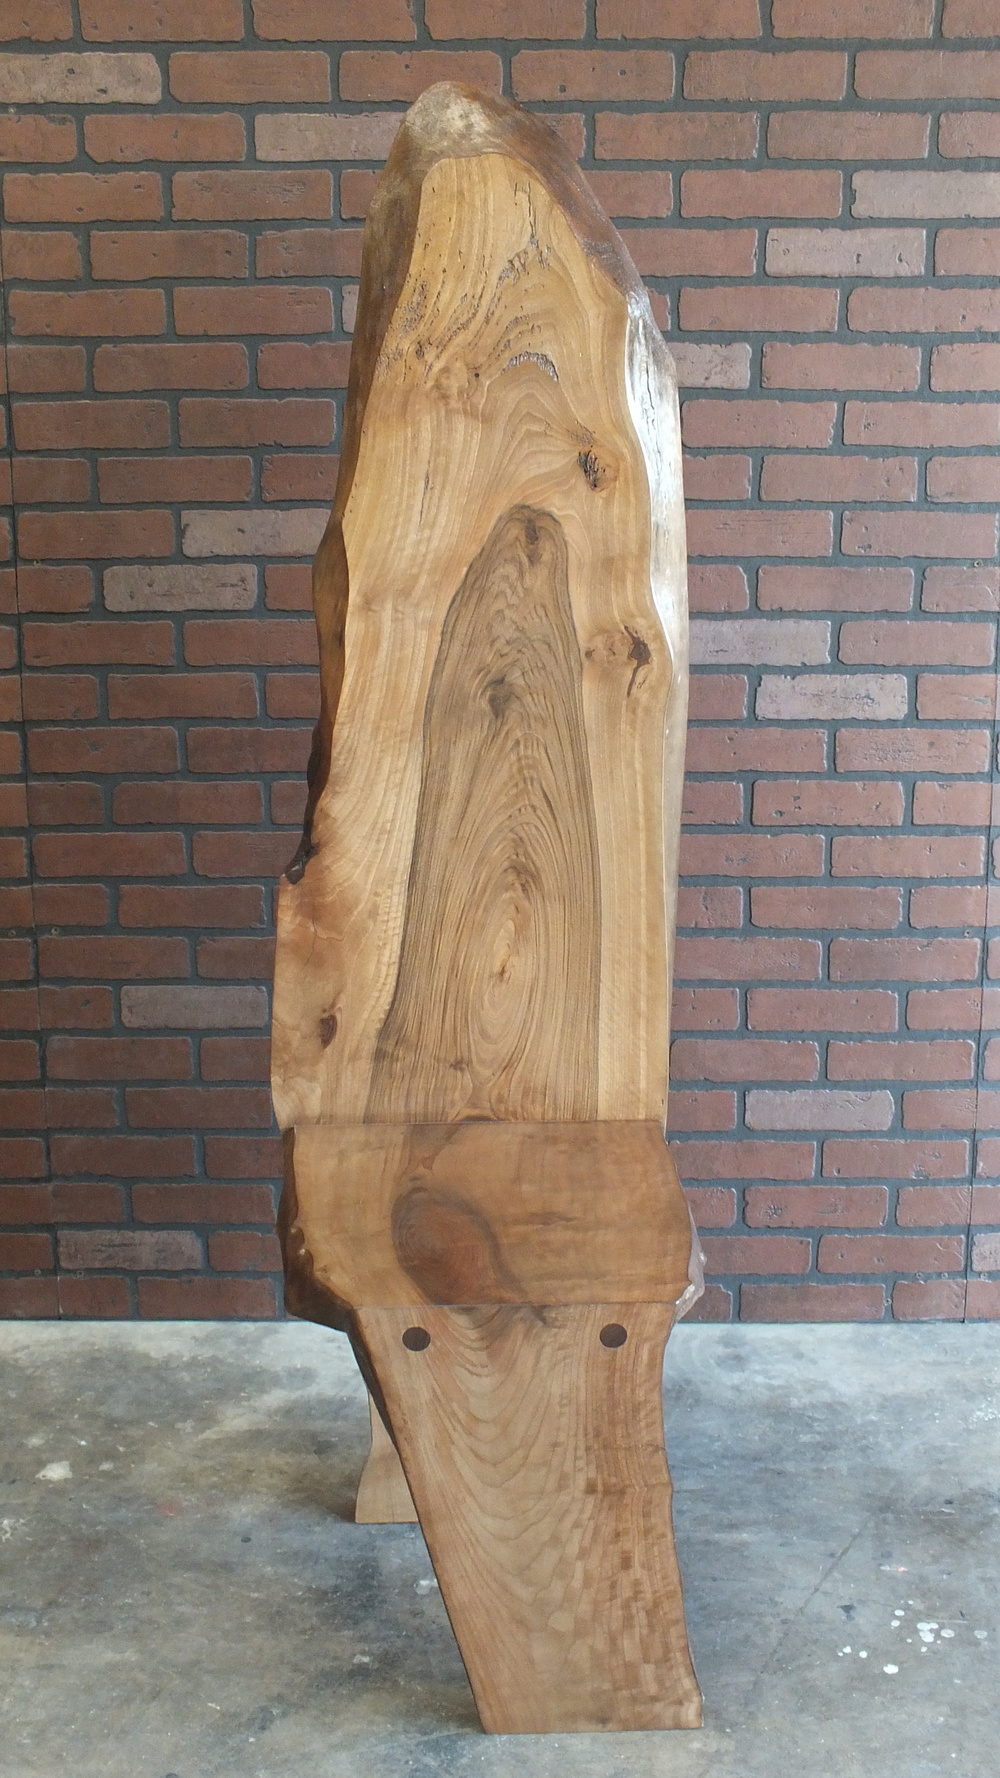 Wood_Sculpture.JPG